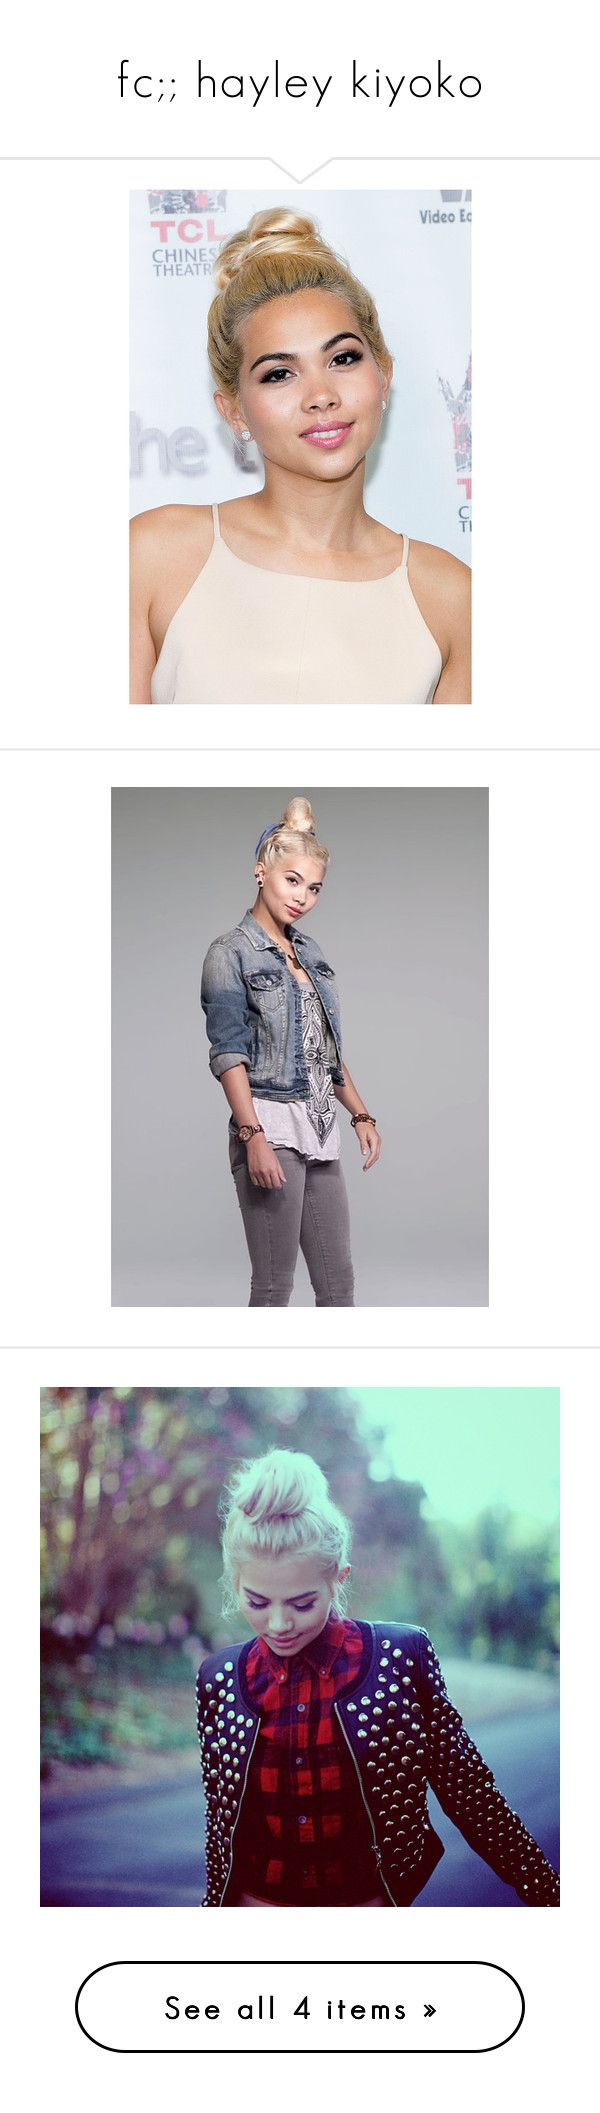 """fc;; hayley kiyoko"" by andsunshine ❤ liked on Polyvore featuring faceclaim, hayleykiyoko, hayley kiyoko, hair, images and pictures"